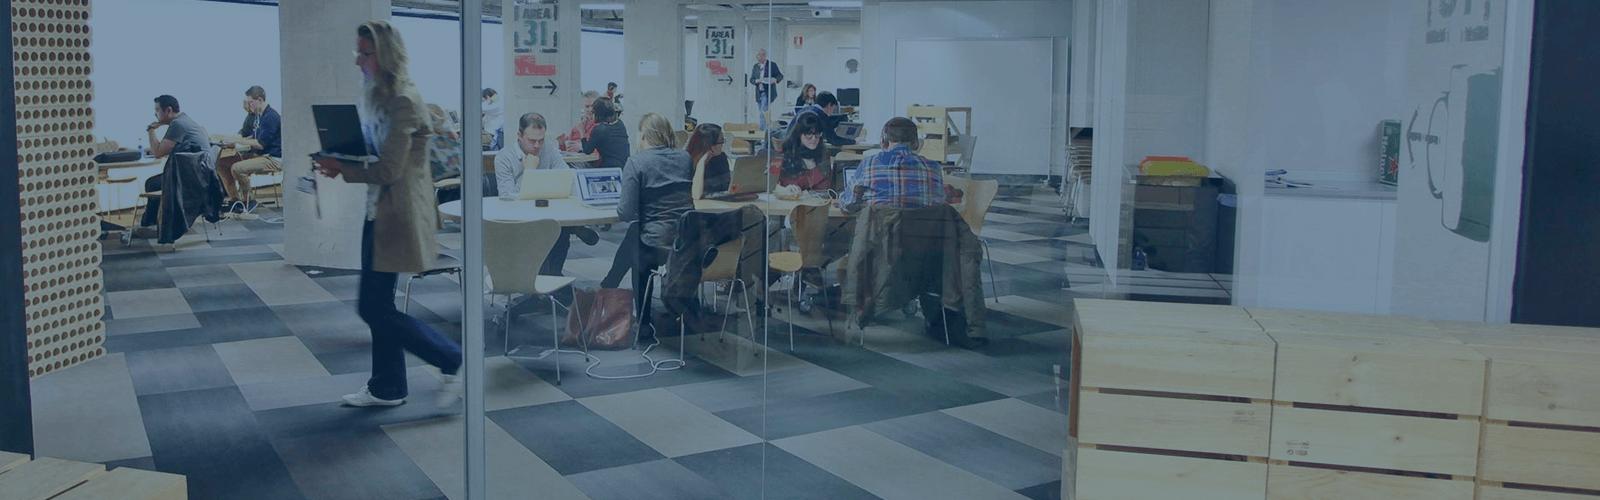 openspace, worker, computer, coworking